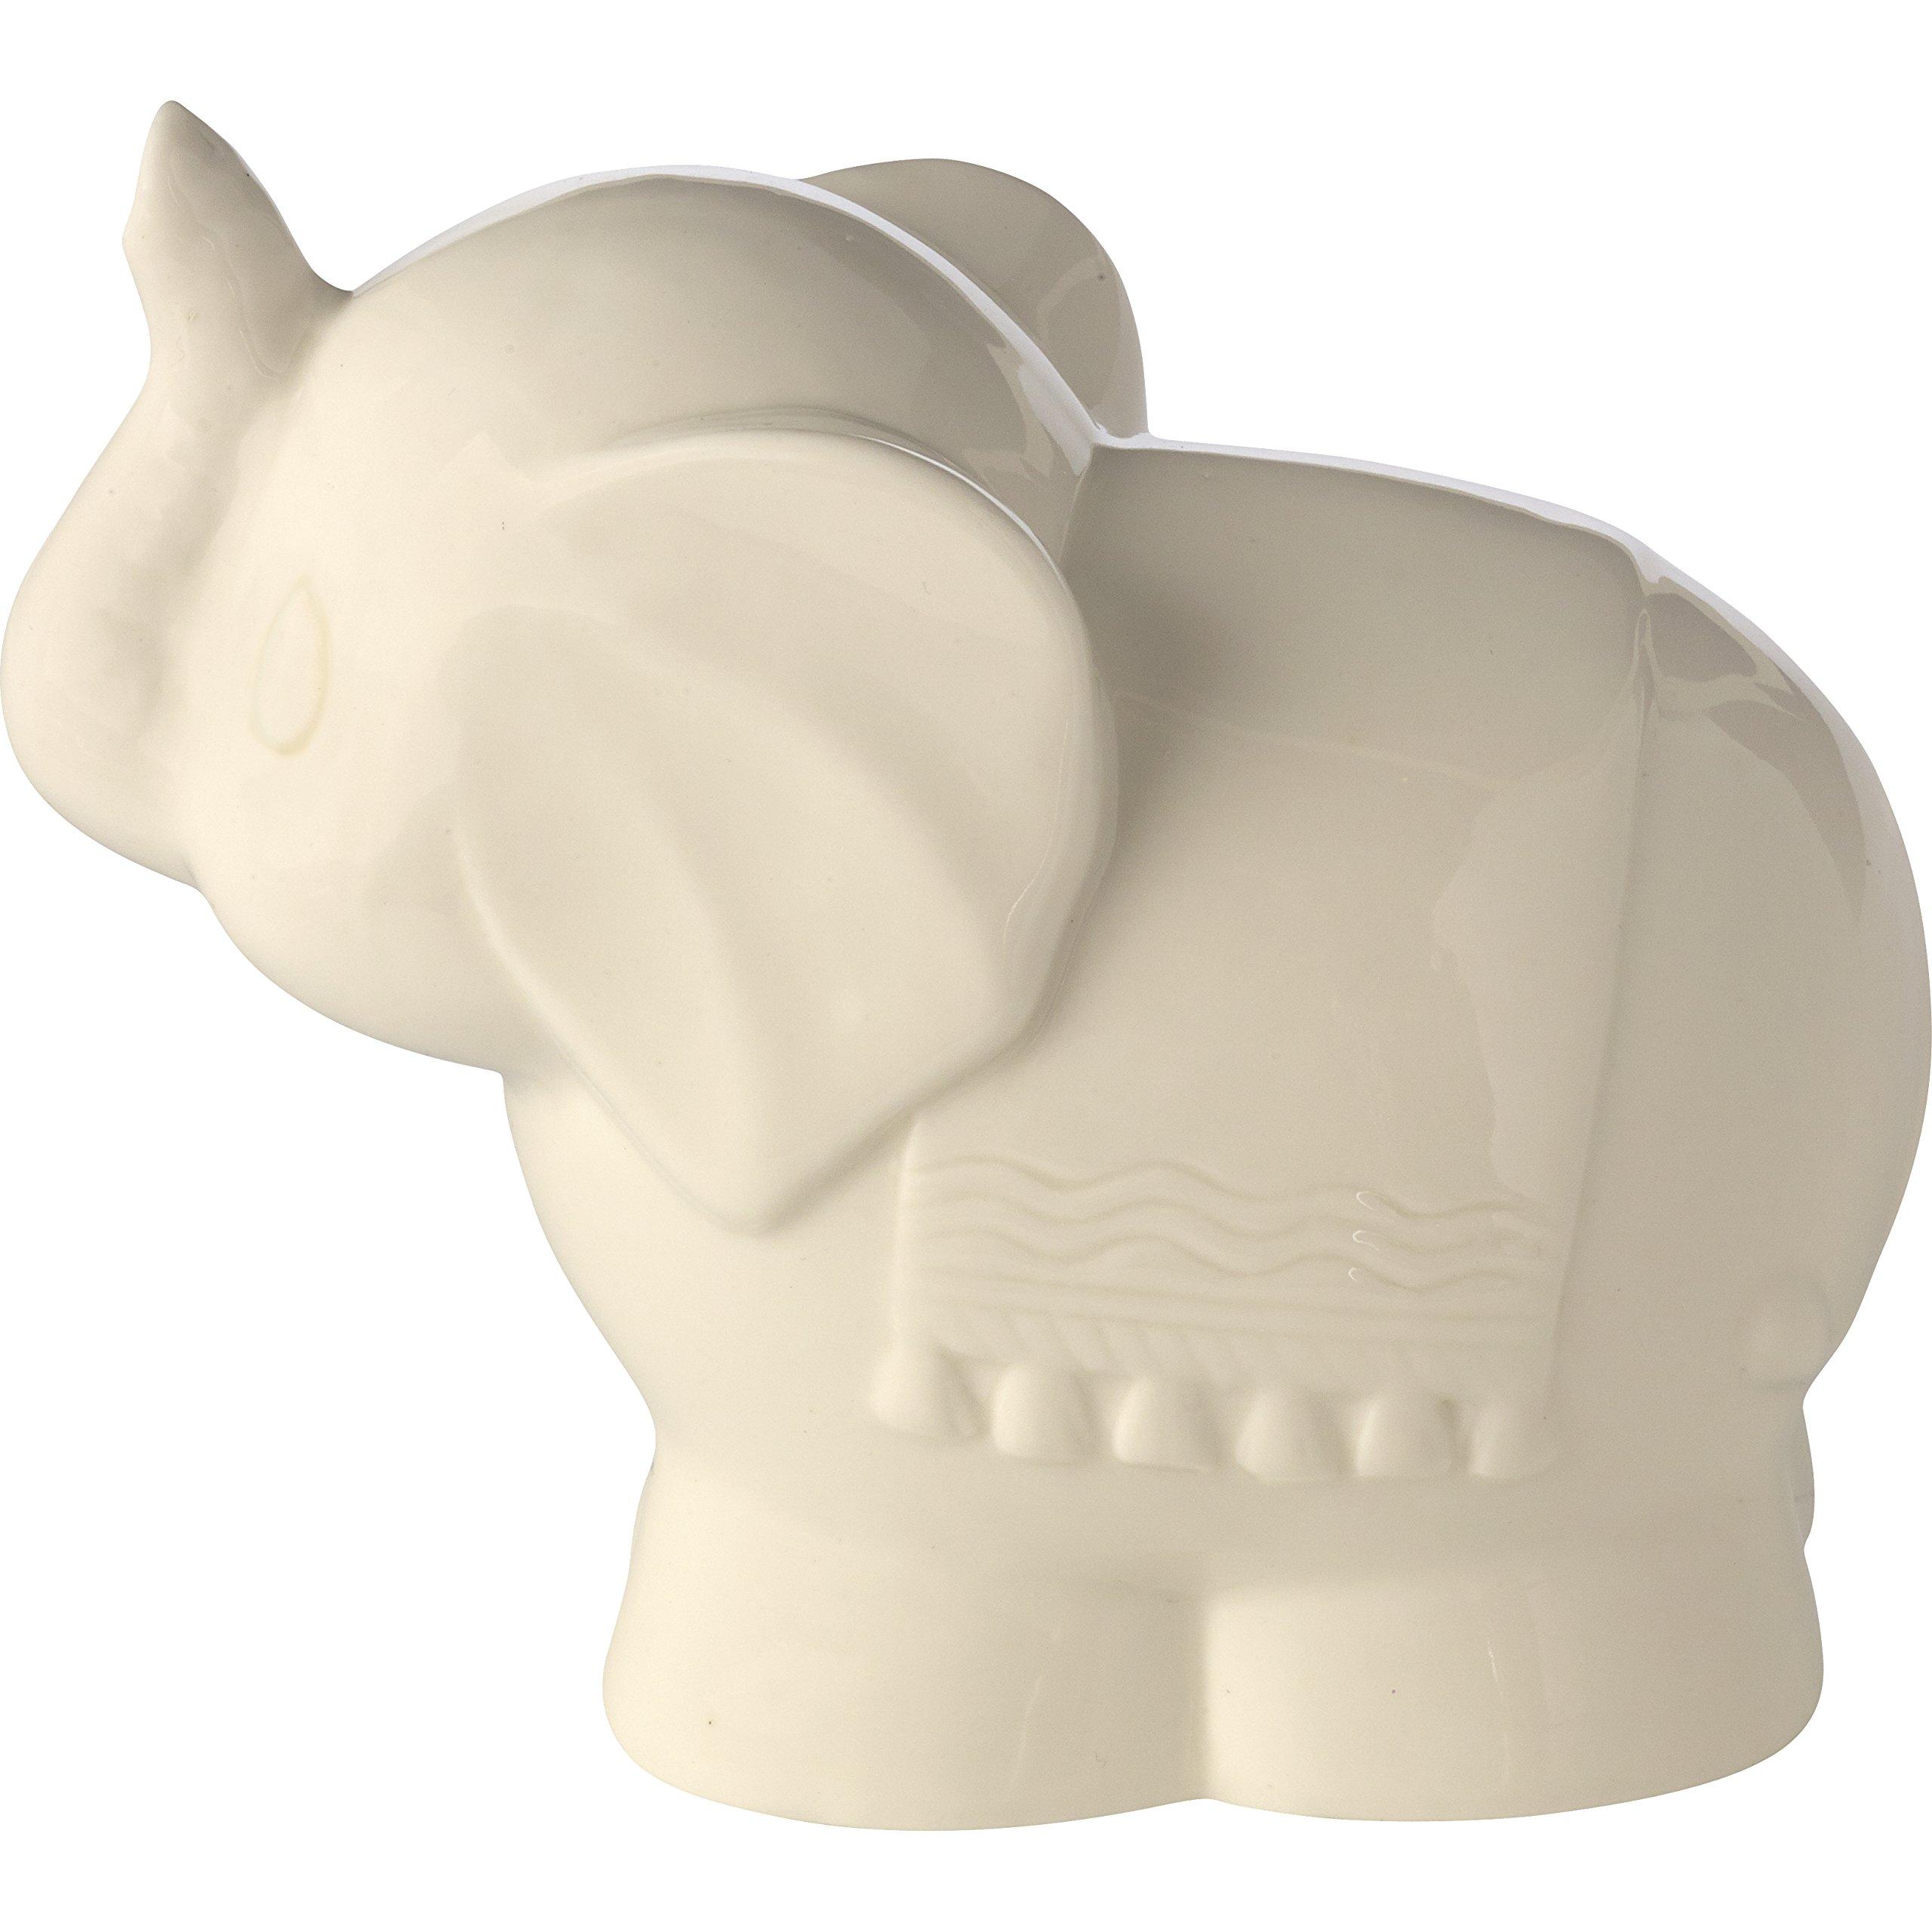 Precious Moments Tuk Elephant Ceramic Battery Operated Nightlight, Beige